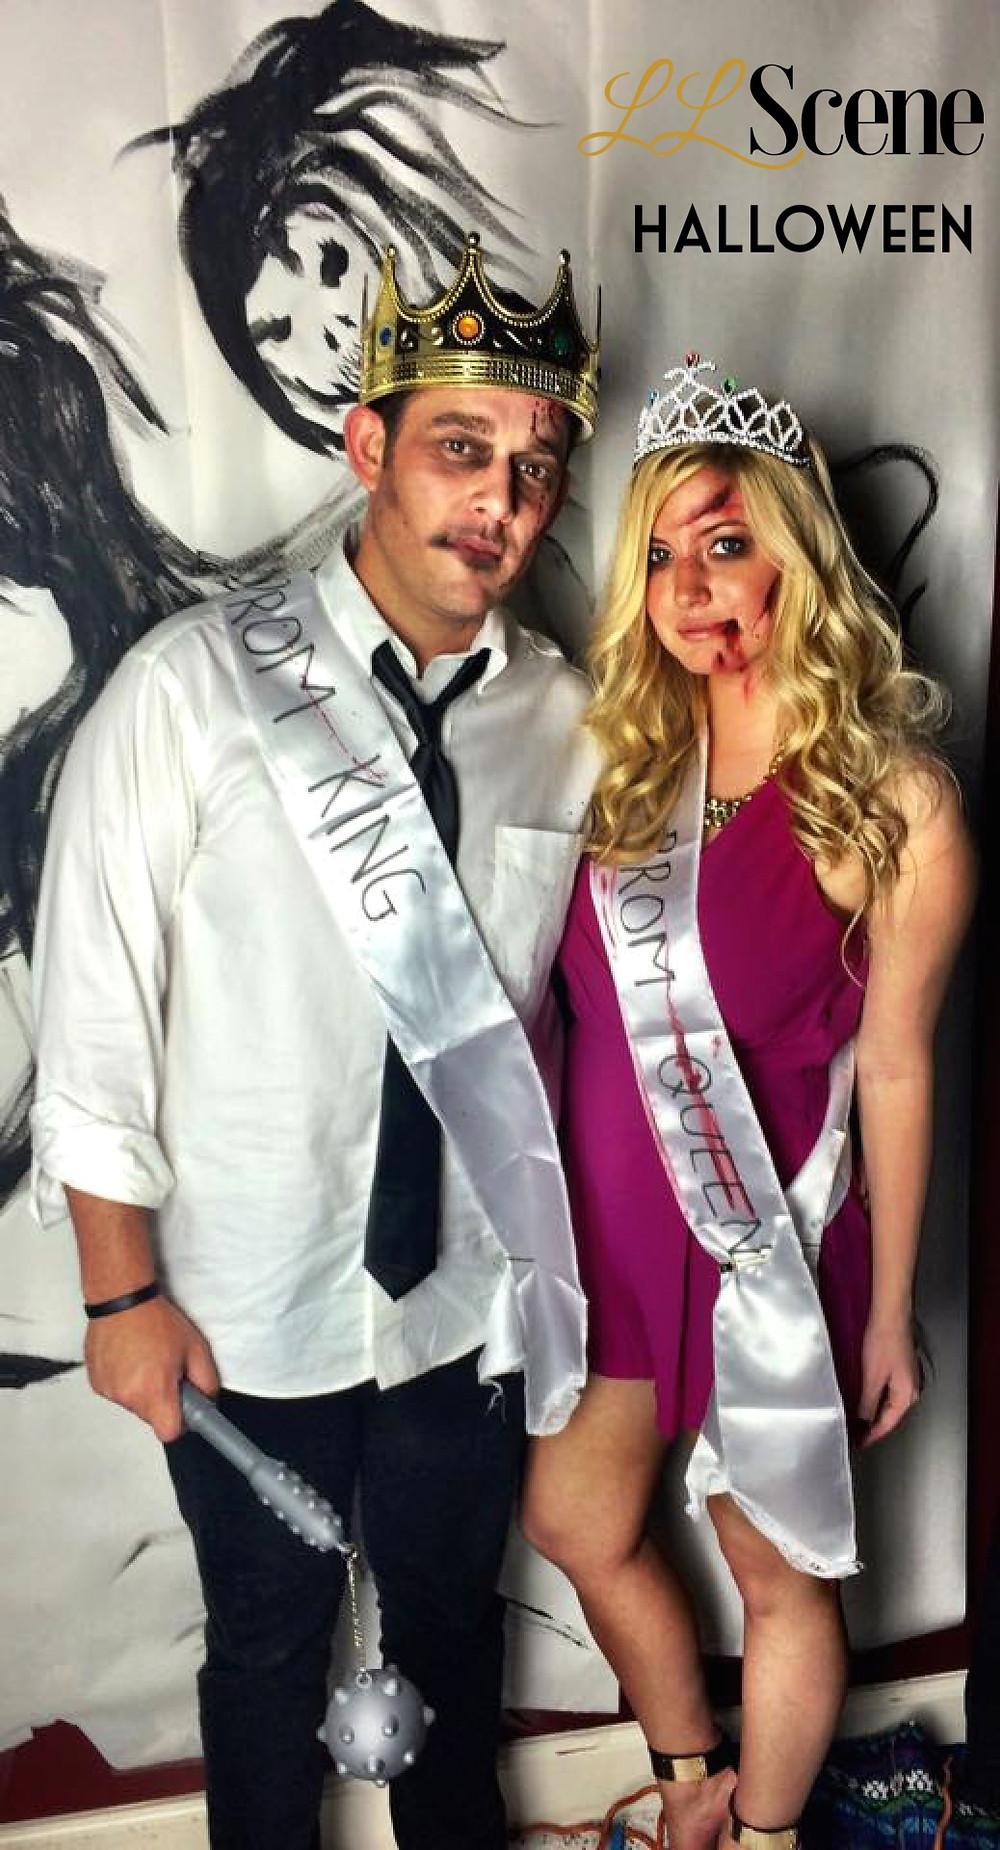 LLScene Halloween